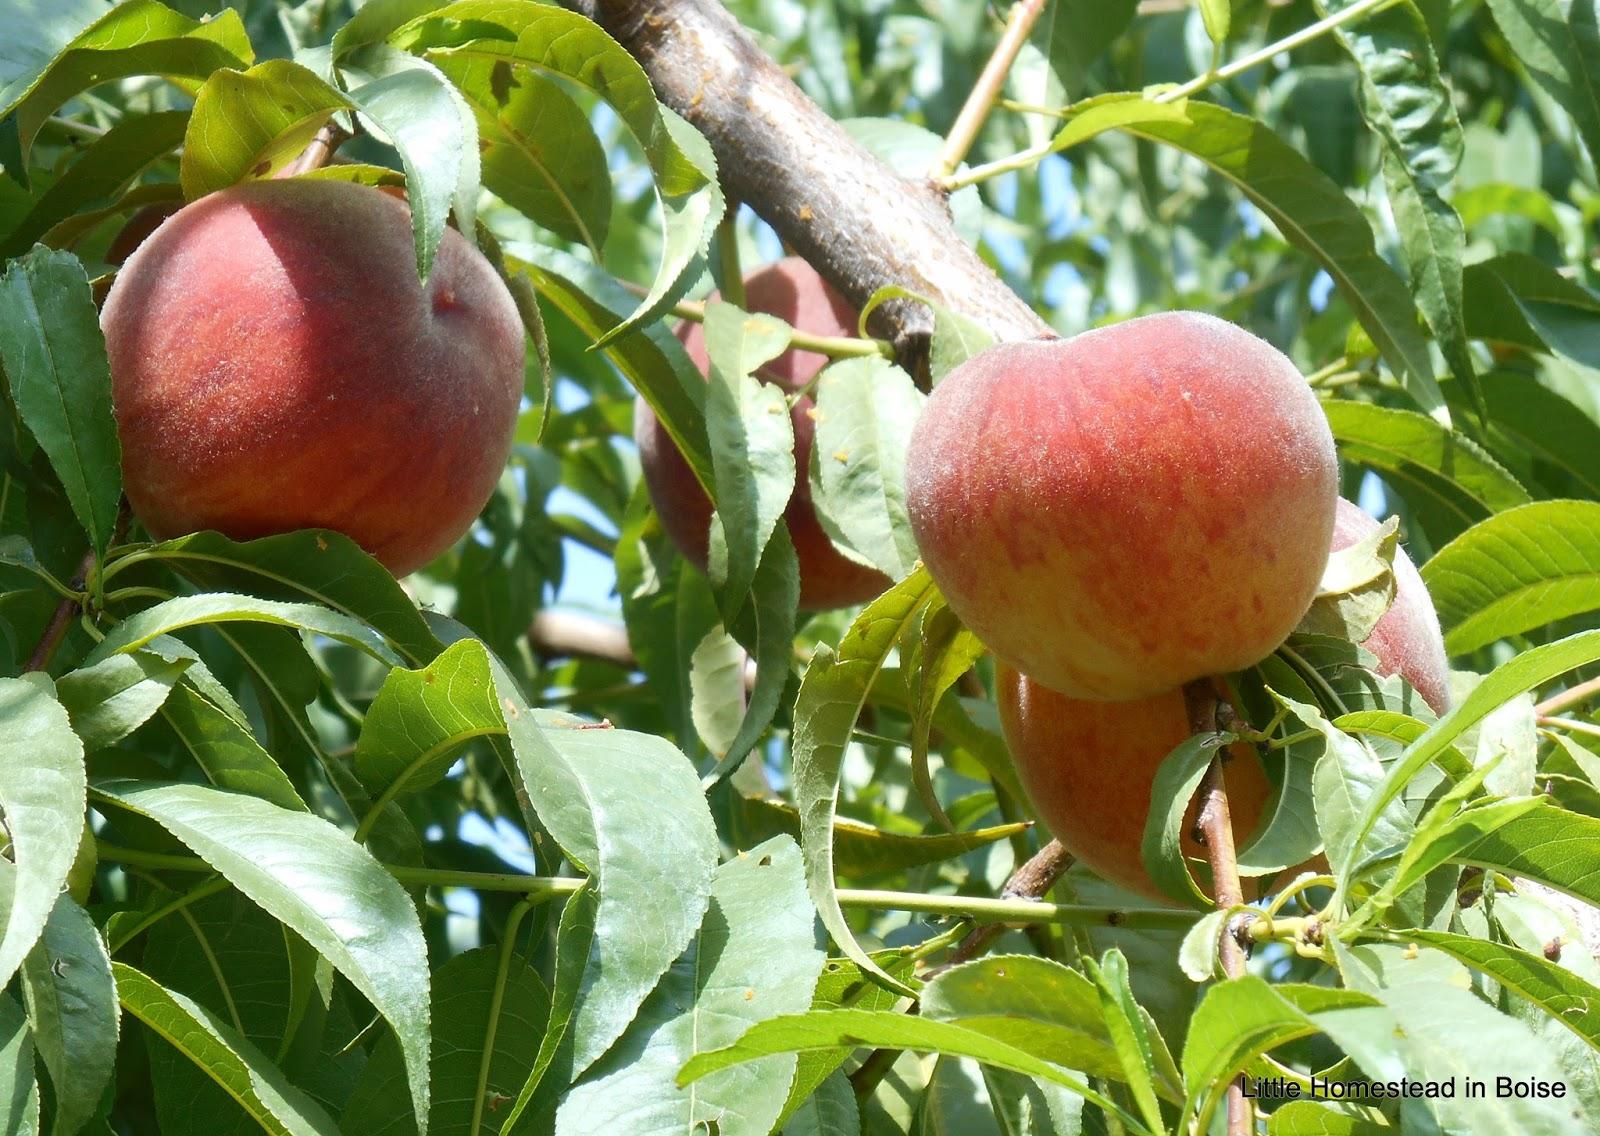 Little homestead in boise organic peach harvest time for Peach tree designs